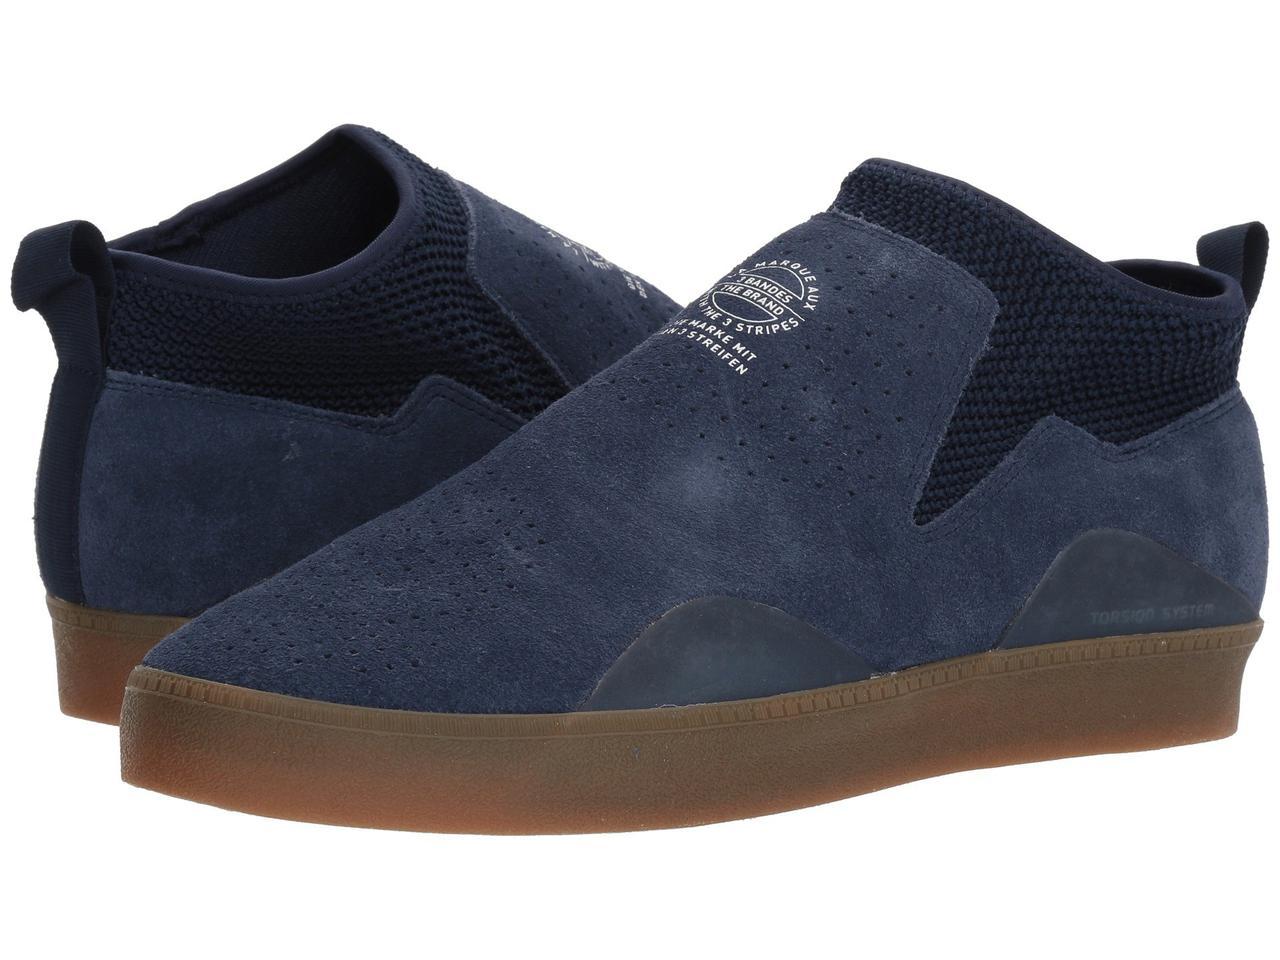 Кроссовки Кеды (Оригинал) adidas Skateboarding 3ST.002 Collegiate  Navy Footwear White b908919d95348